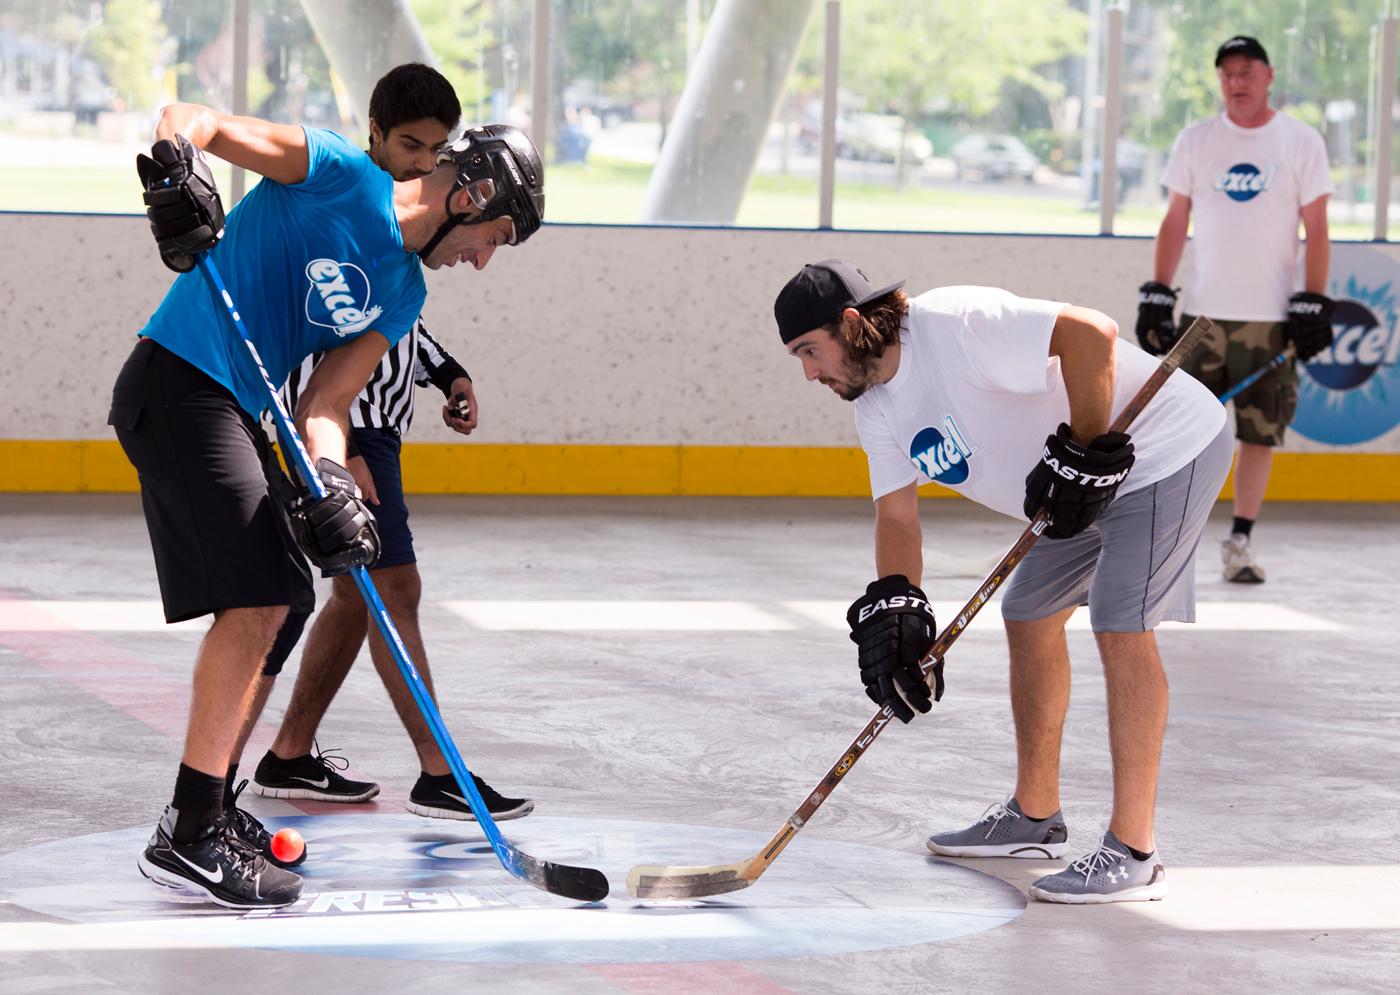 Excel hockey event.